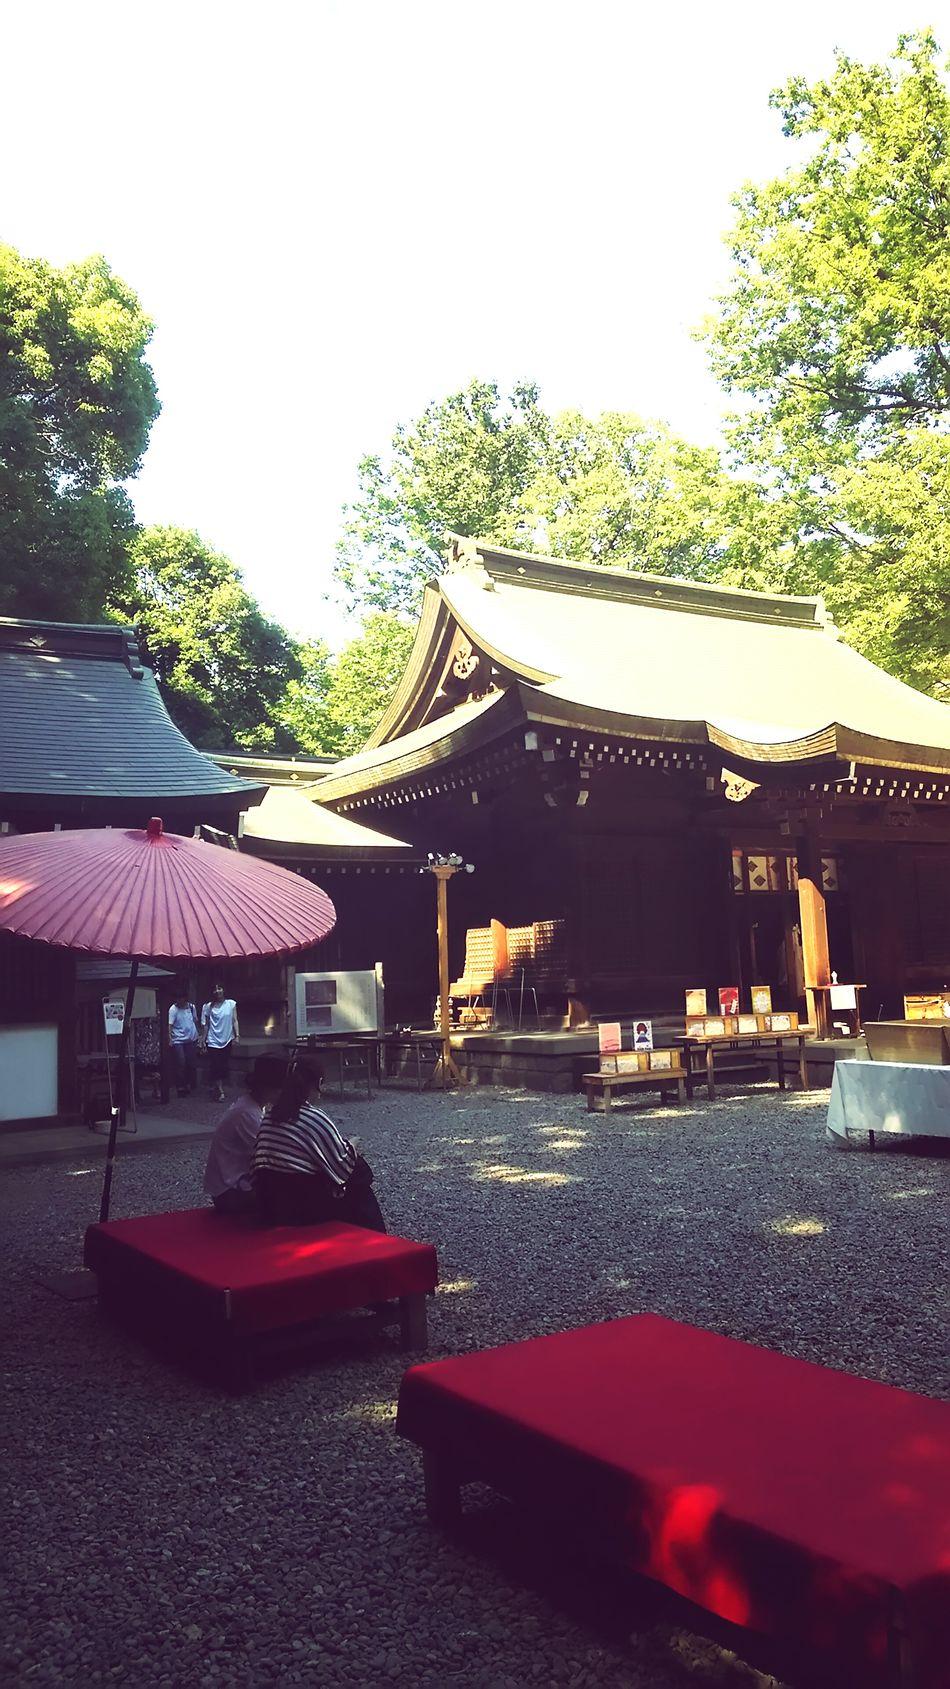 氷川神社 境内 Japanese Shrine 川越 Japan